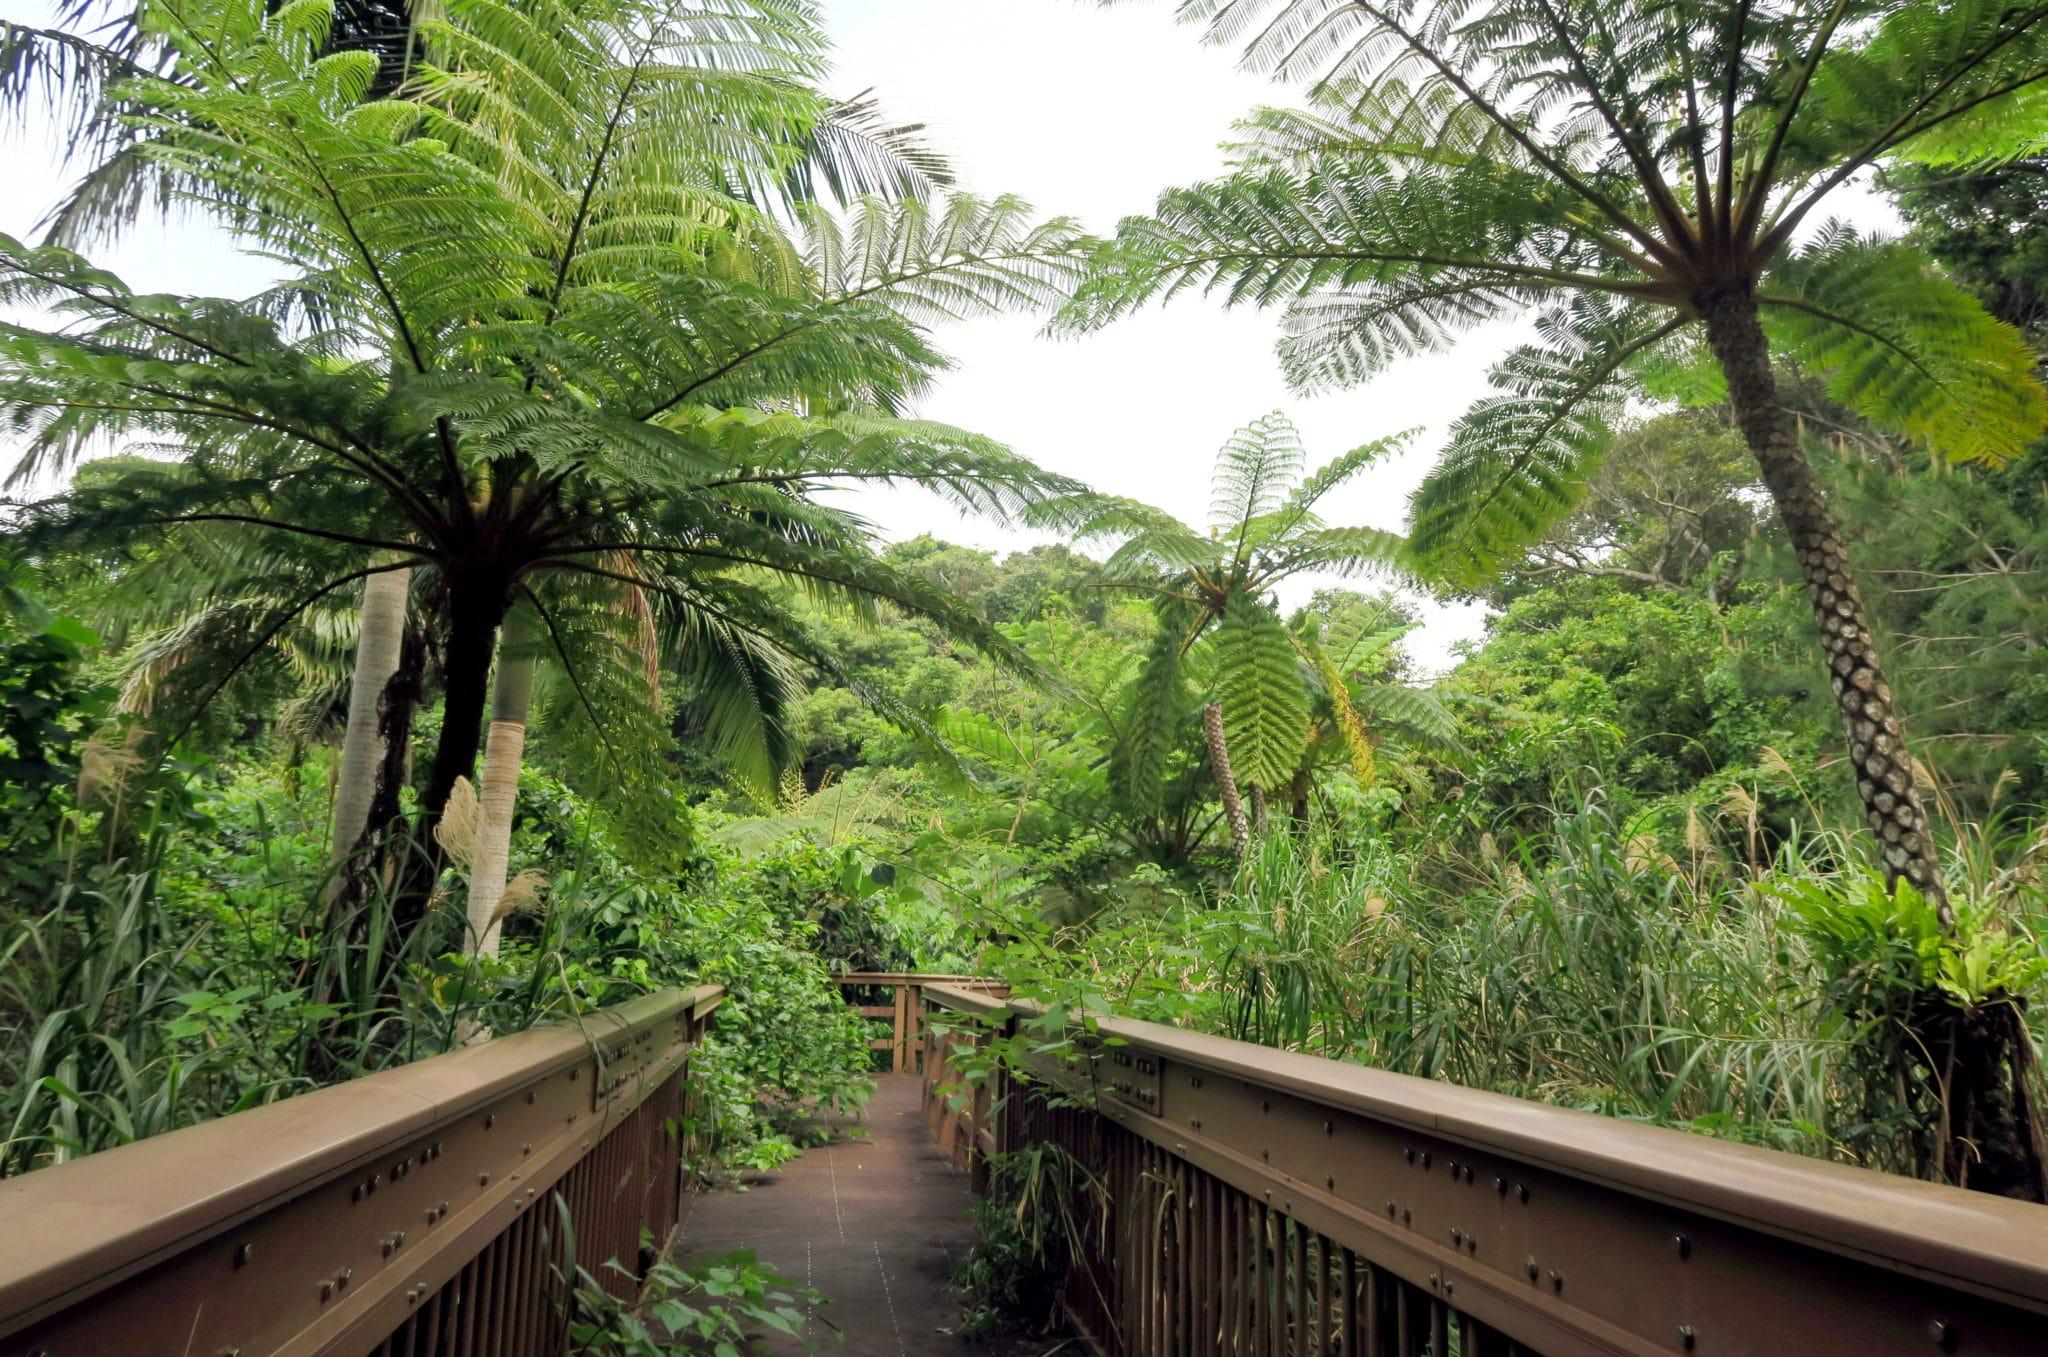 Banna Park Ishigaki Okinawa Japan